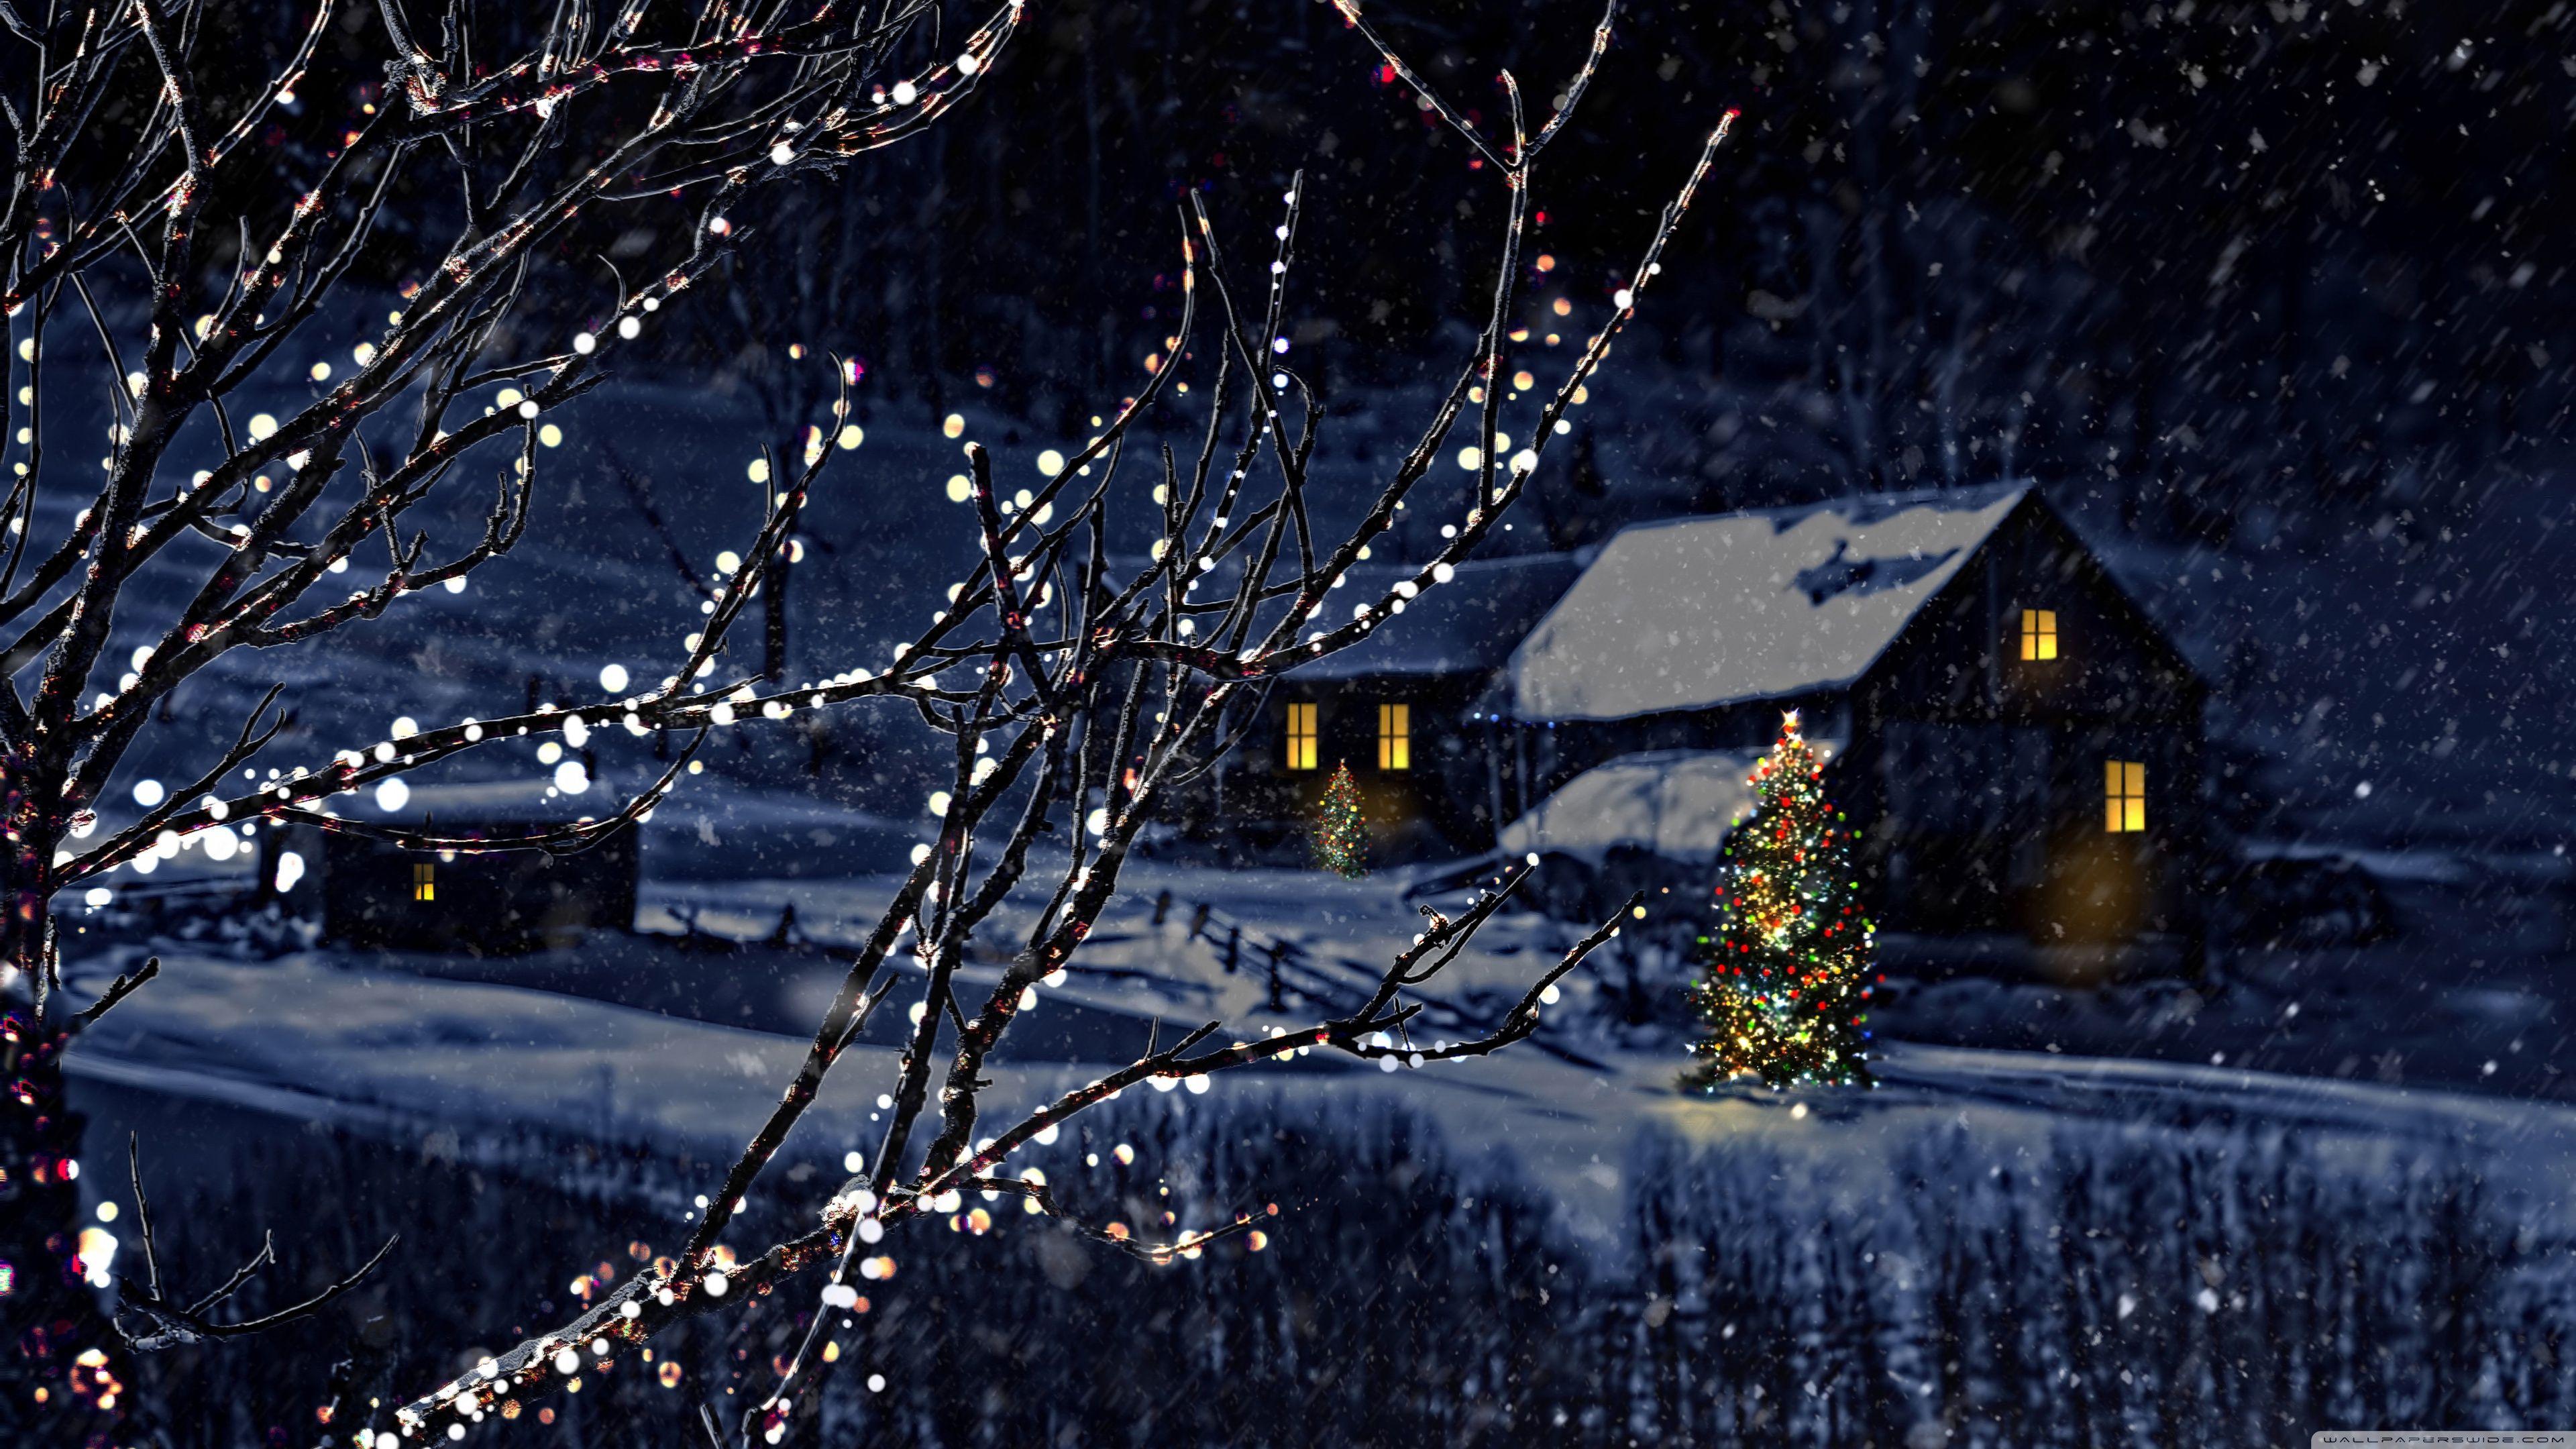 100 Holiday Scenes Wallpaper Hd Wallpapers: Christmas HD Wallpaper X